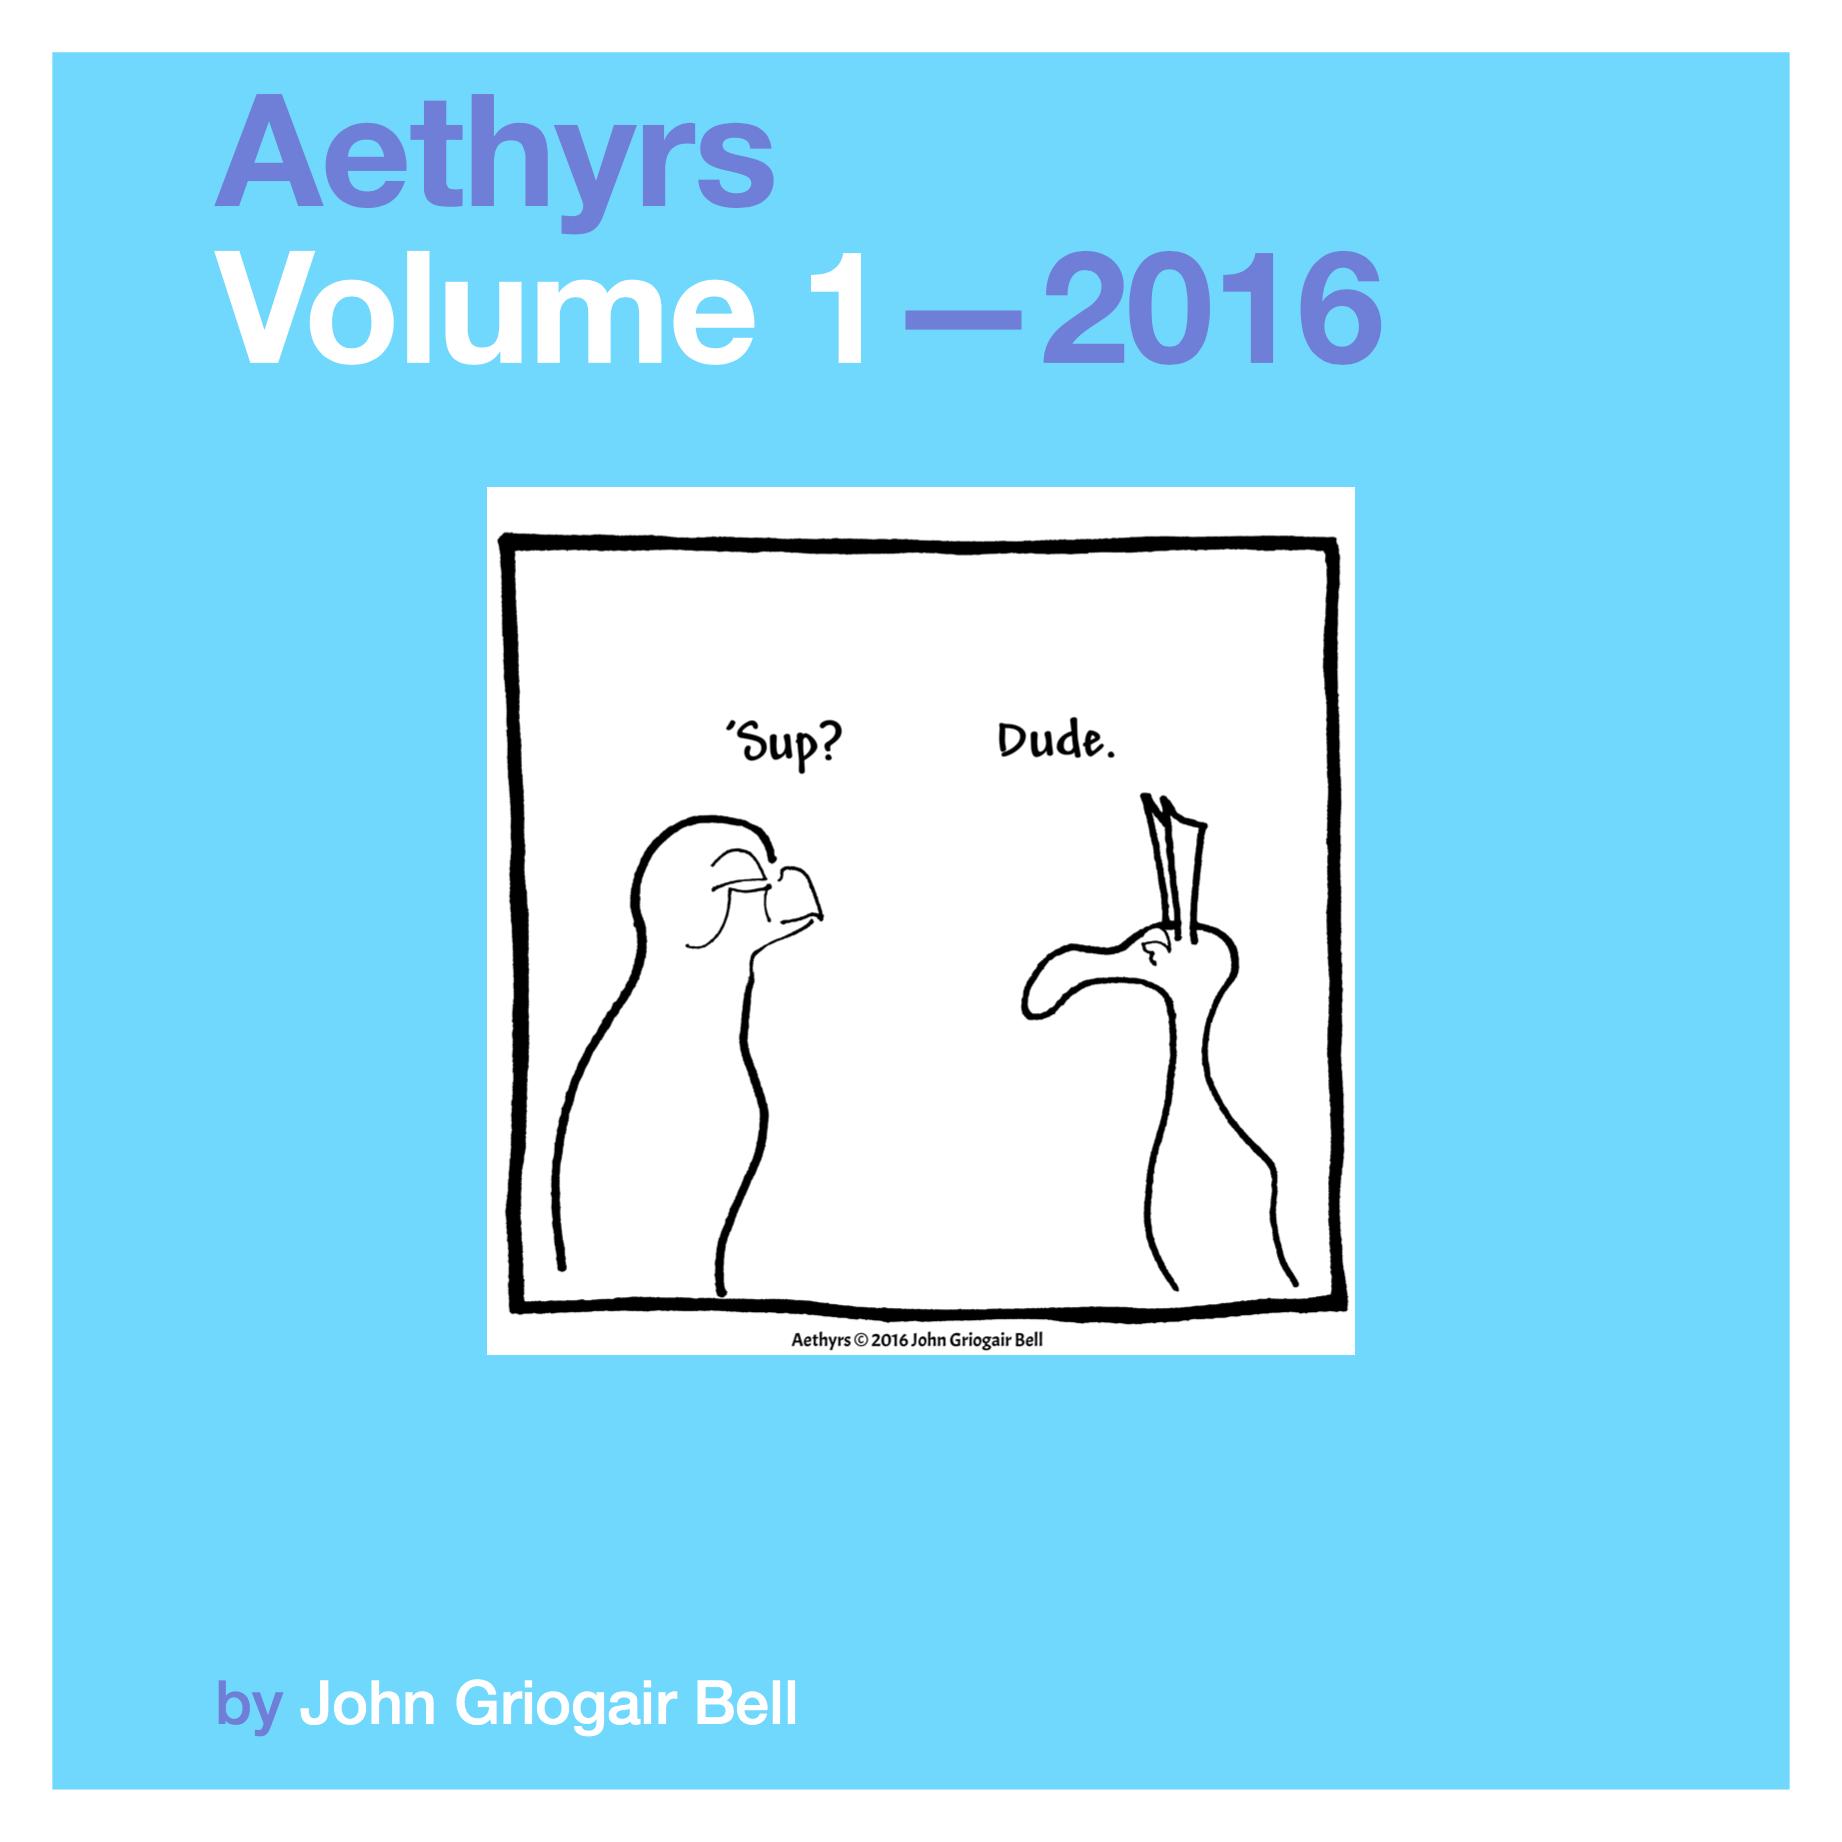 Aethyrs Volume 1 2016 cover